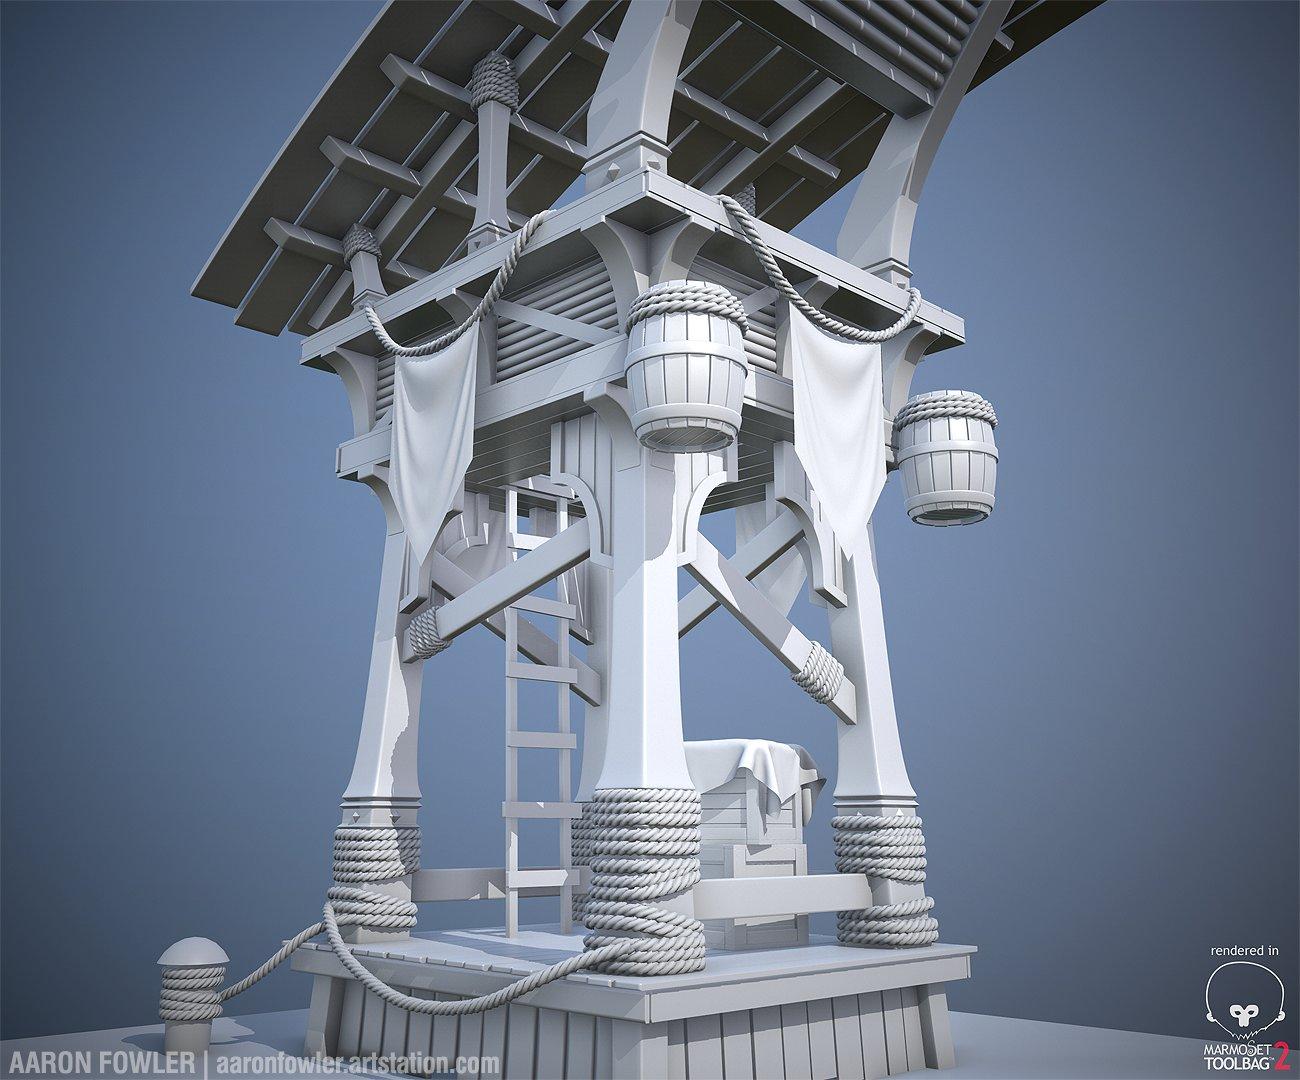 aaron-fowler-aaron-fowler-piratetower-wip02.jpg?1439300235